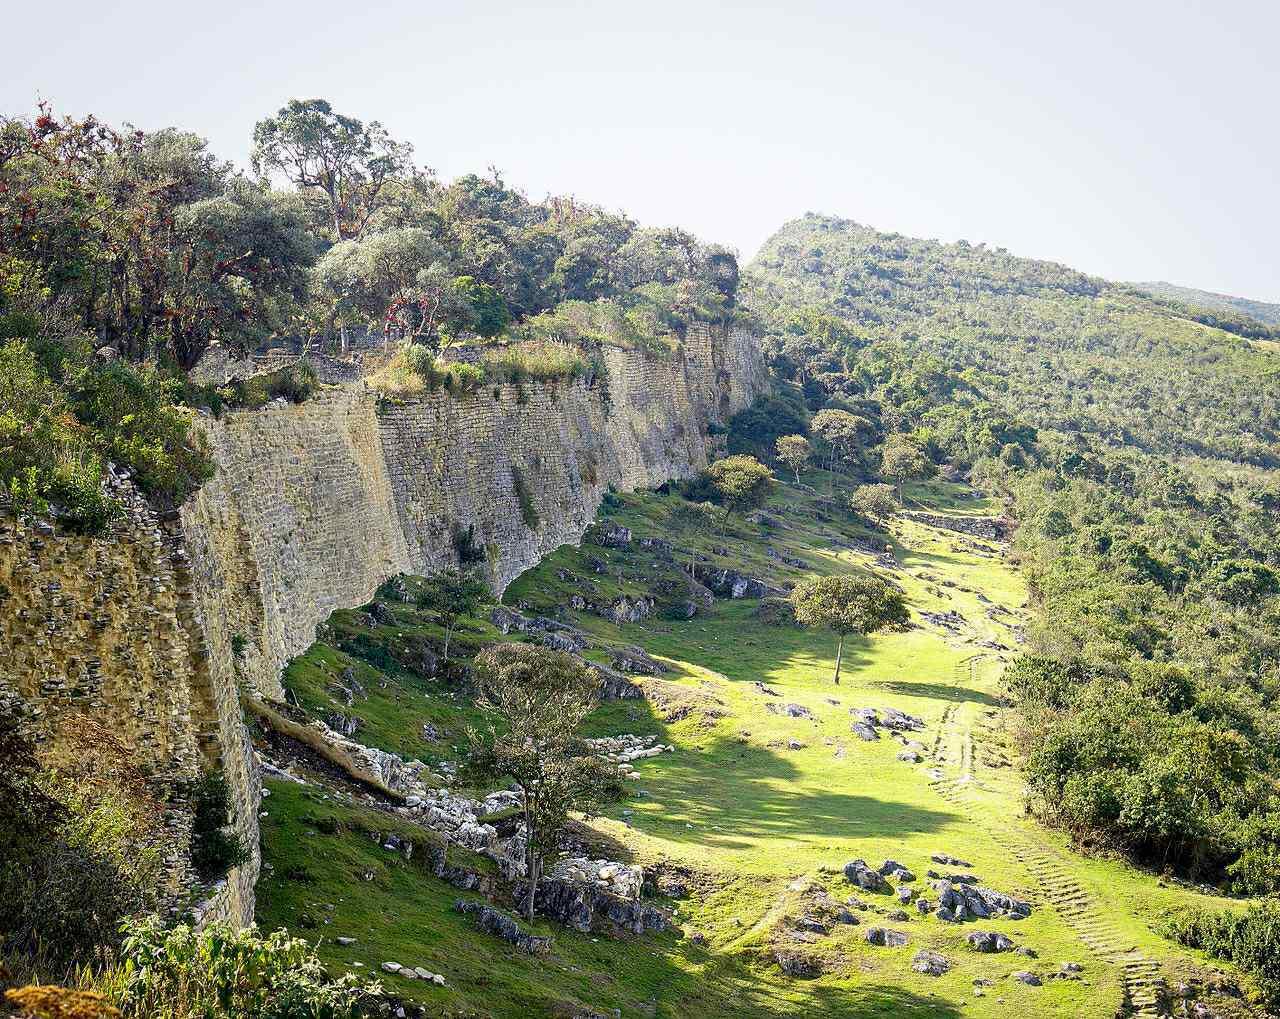 Massive exterior walls, the eastern facade of the Citadel of Kuélap, Peru.